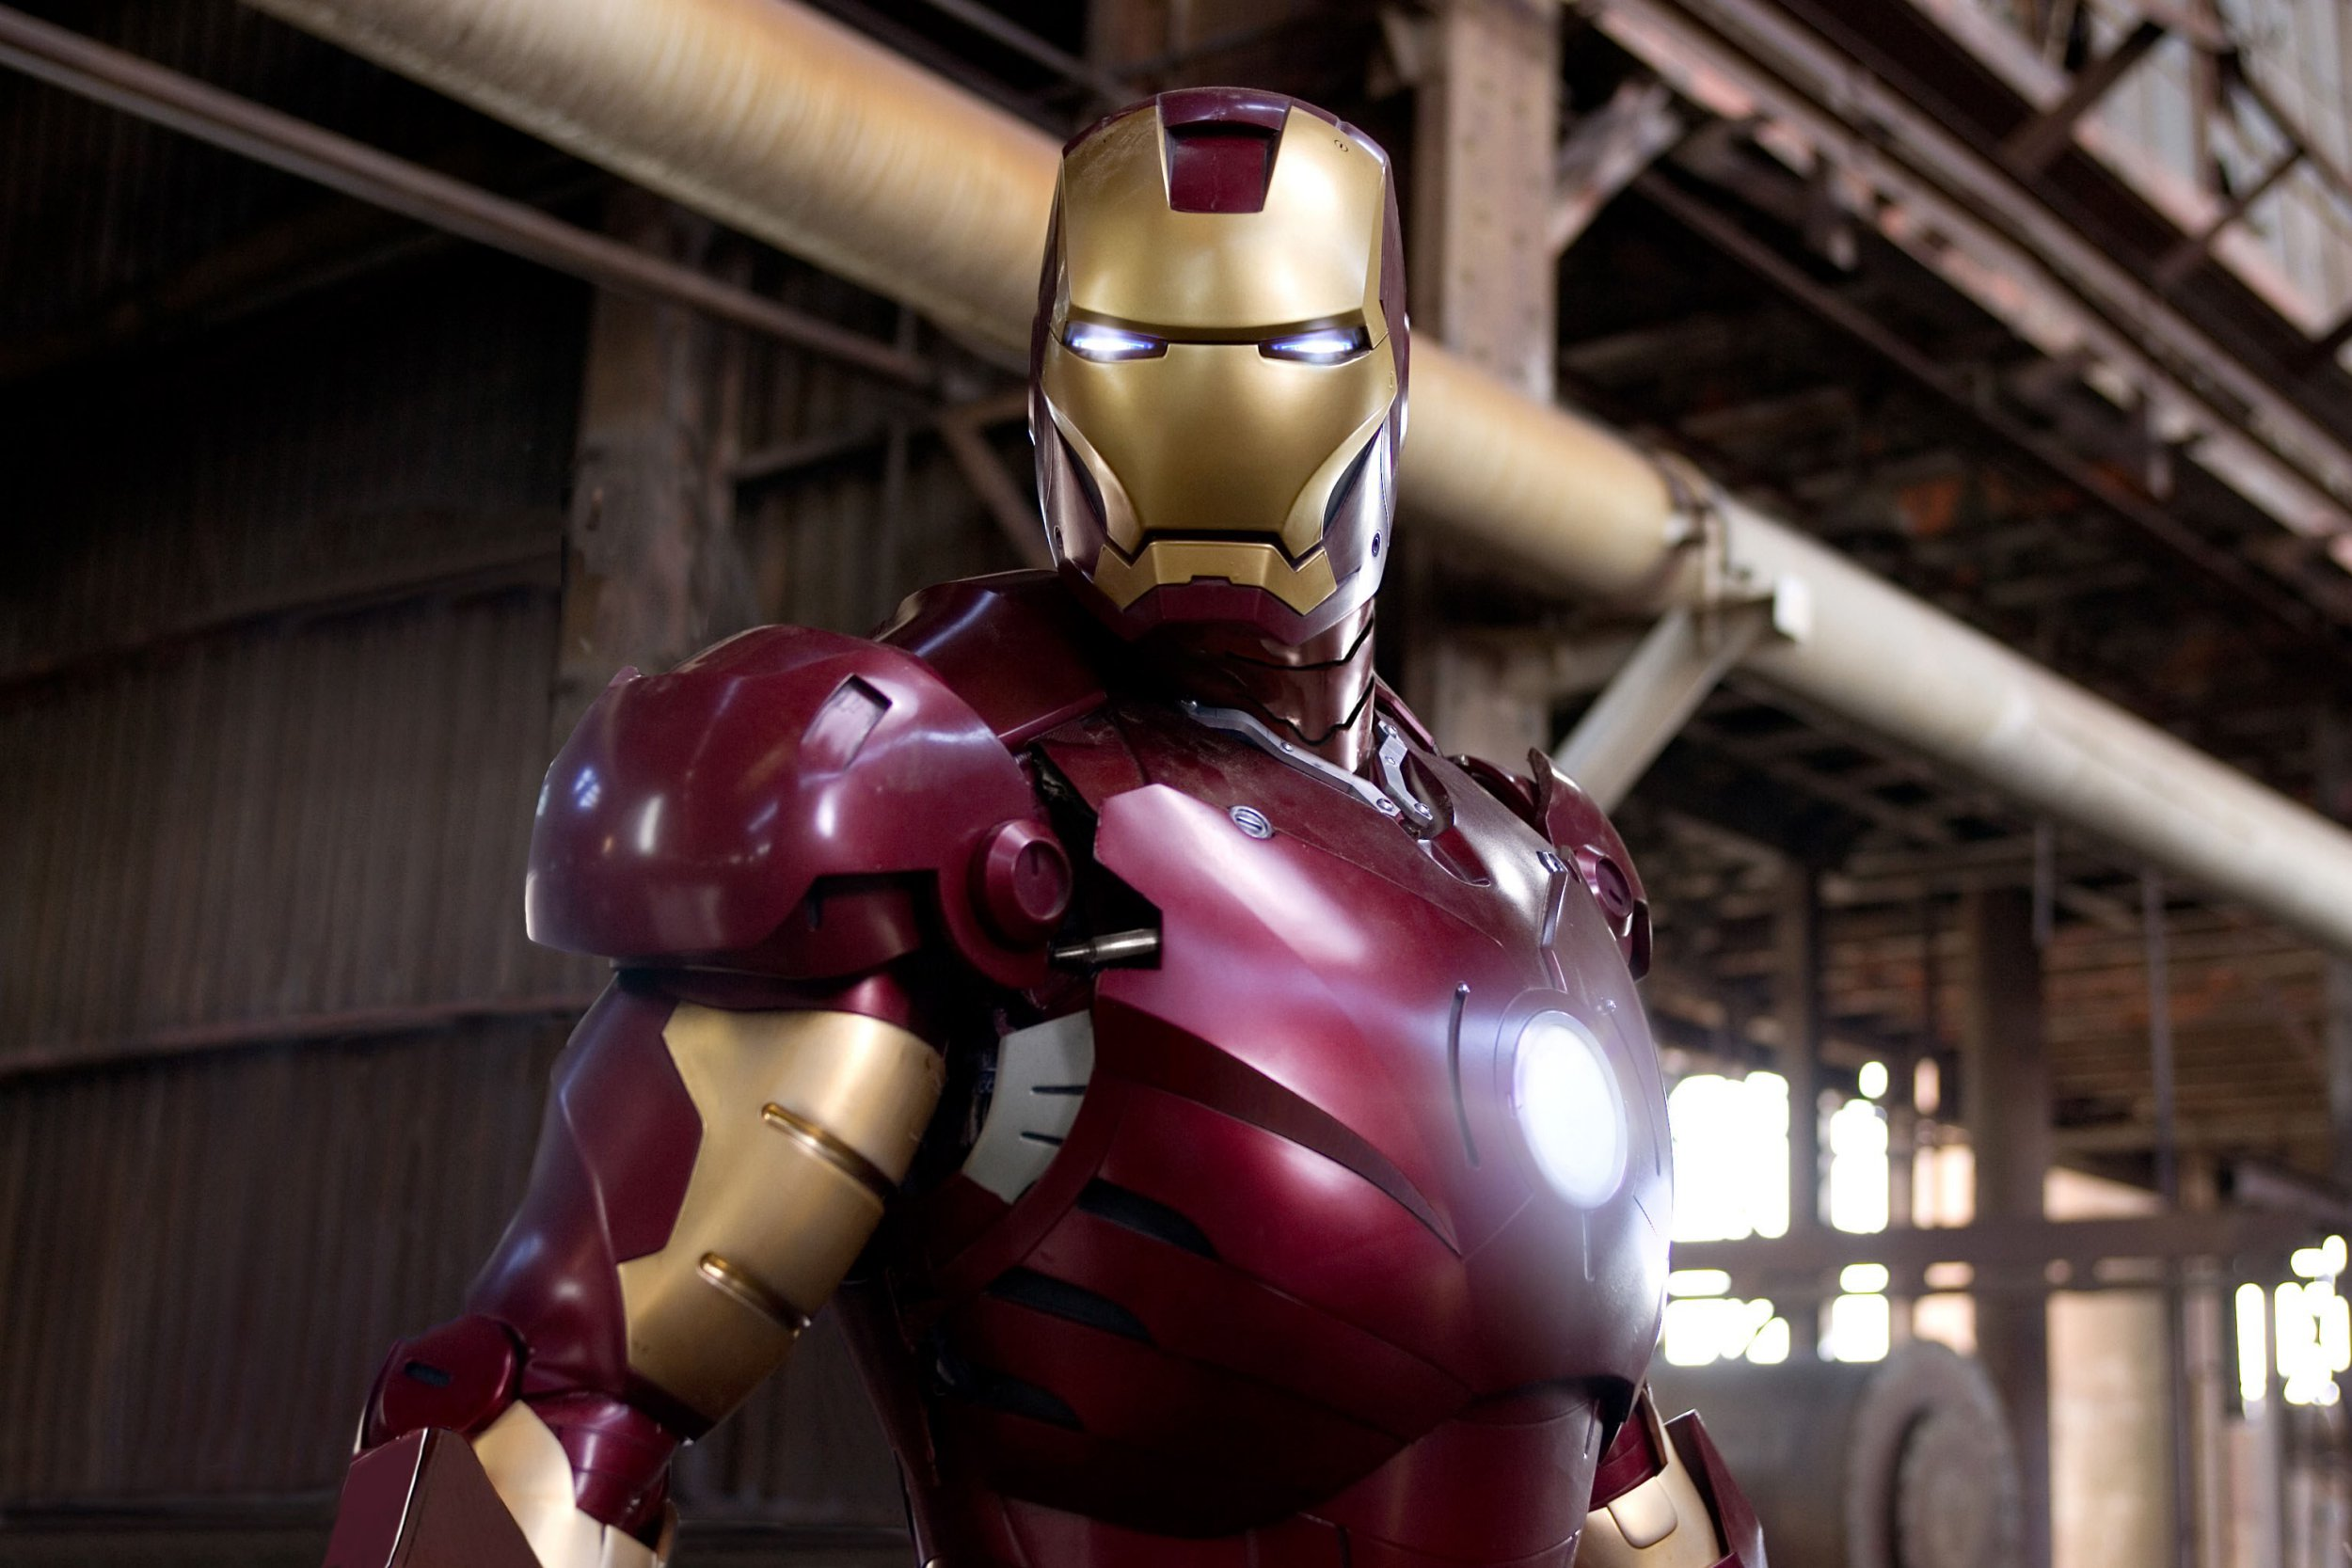 Editorial use only. No book cover usage. Mandatory Credit: Photo by Marvel/Paramount/Kobal/REX/Shutterstock (5886260bm) Robert Downey Jr Iron Man - 2008 Director: Jon Favreau Marvel/Paramount USA Scene Still Animation Ironman